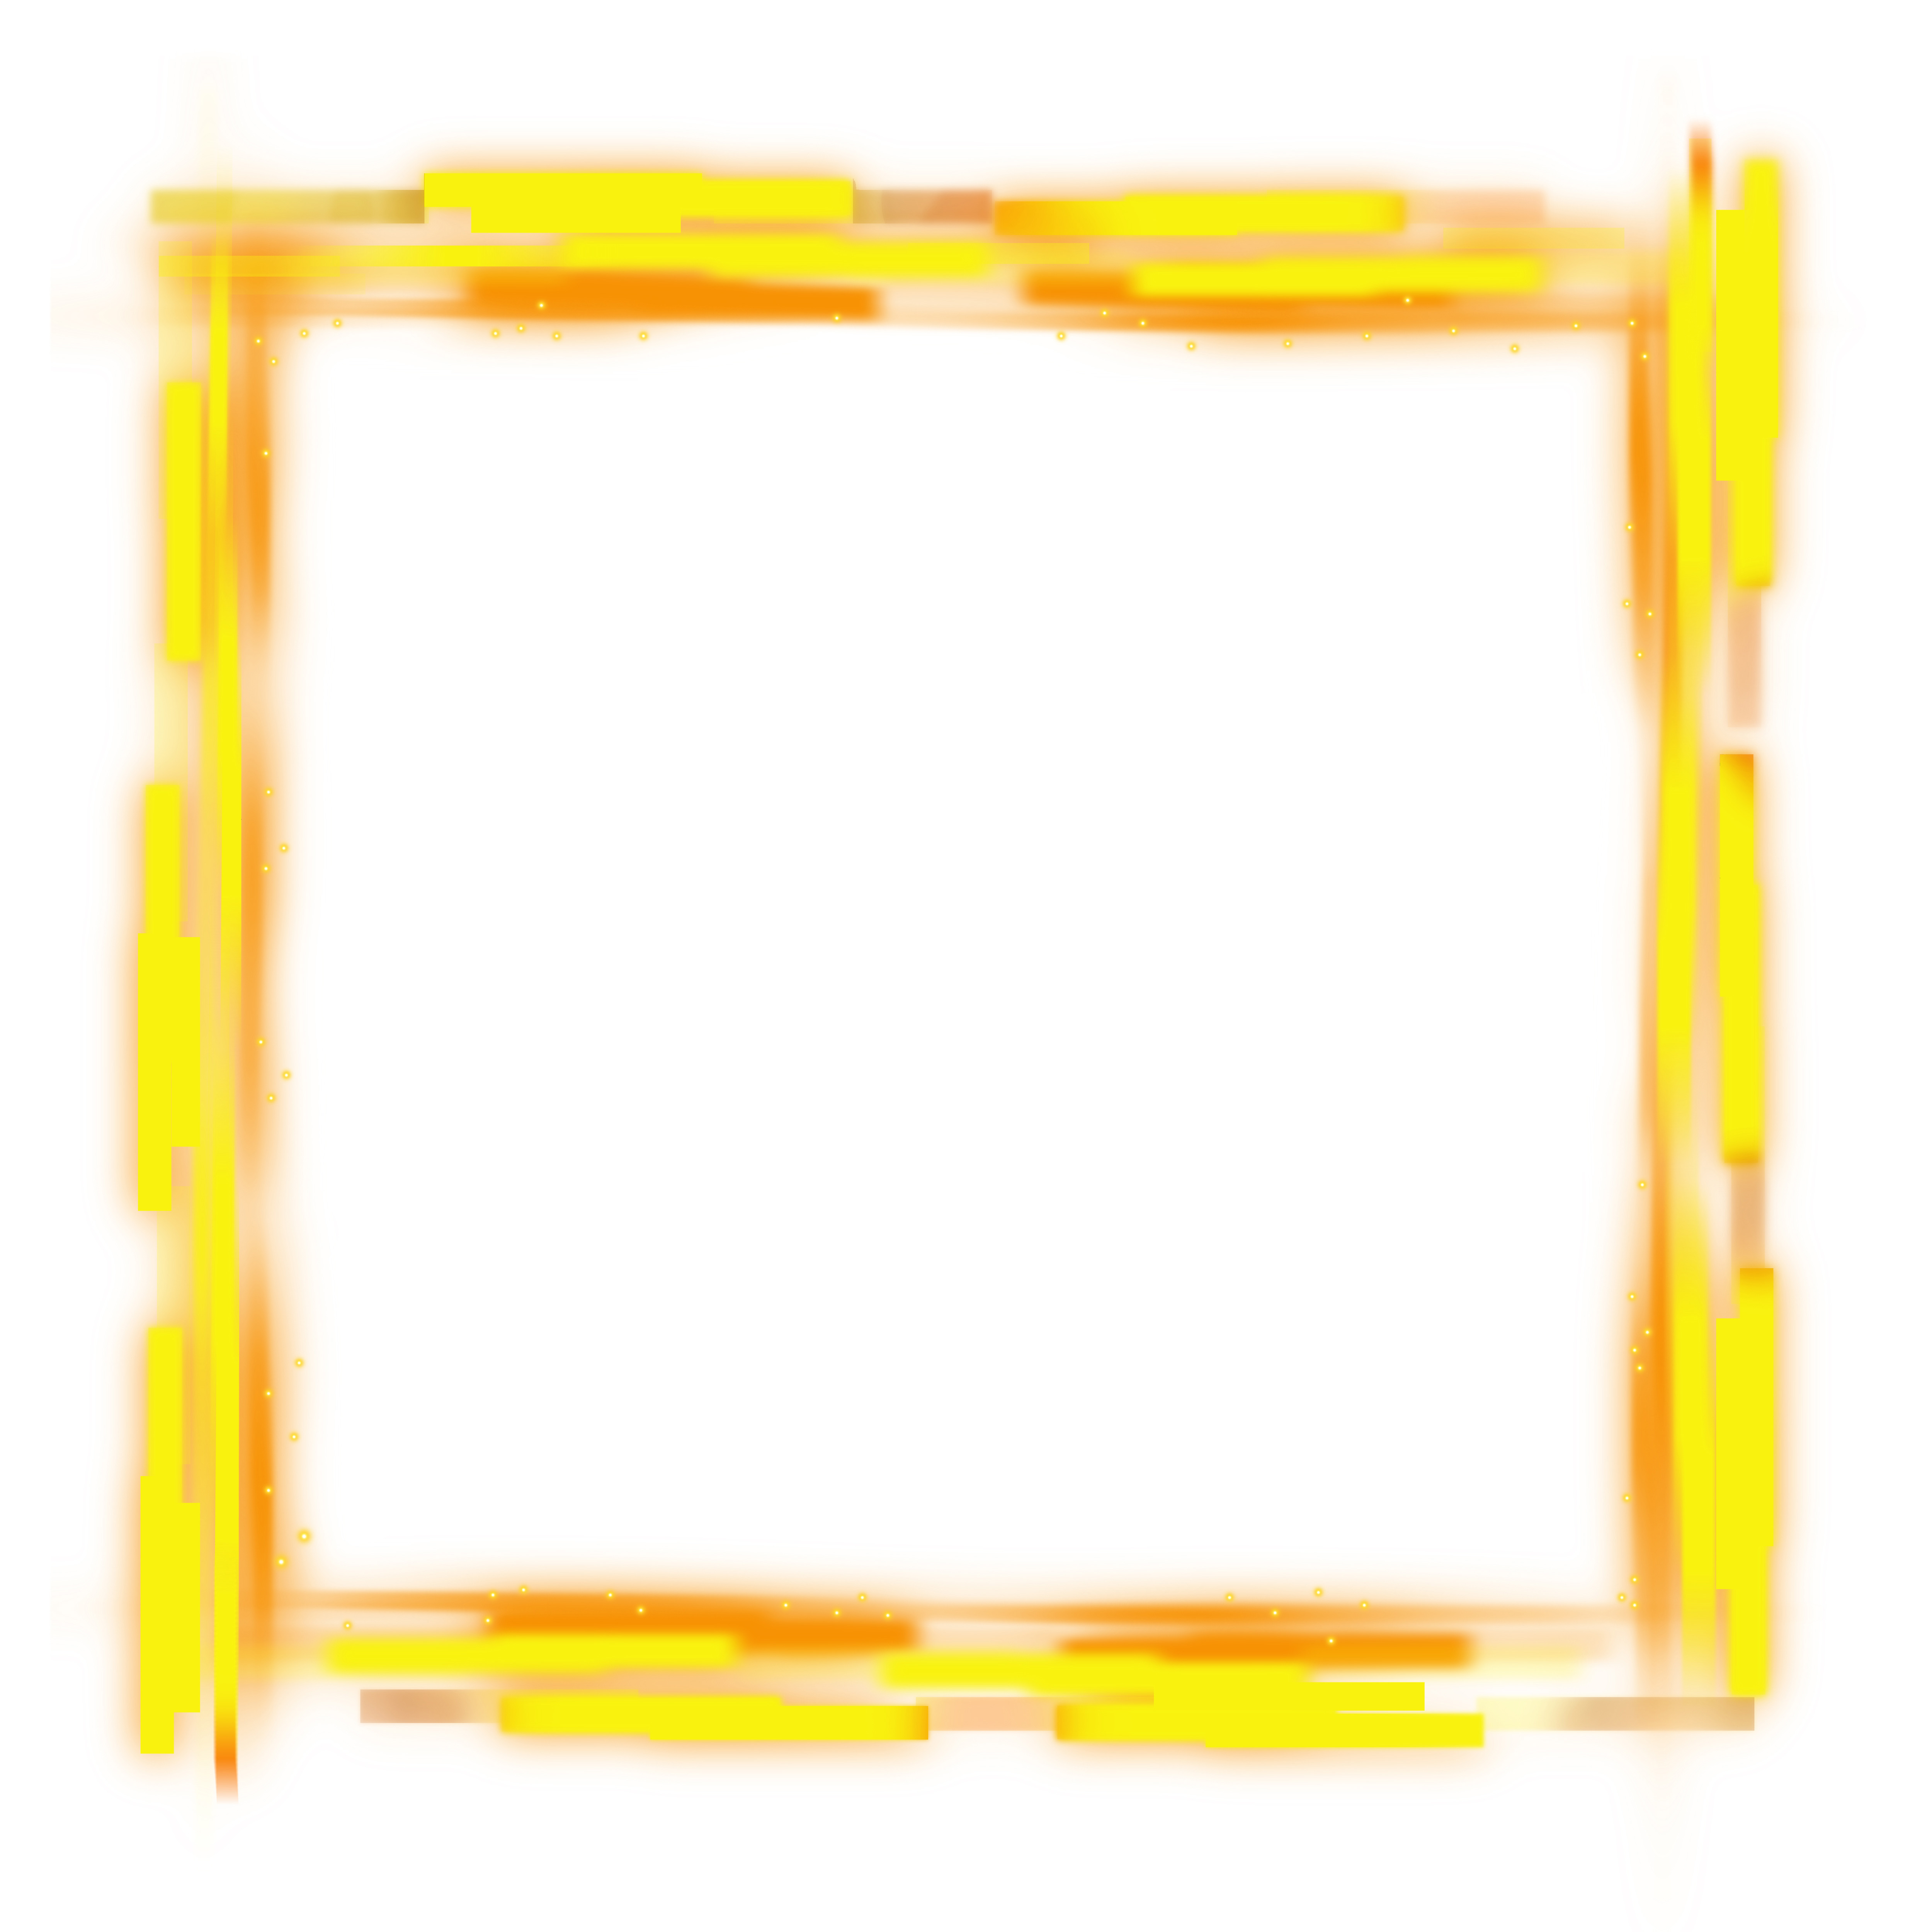 Рамки в фотошоп